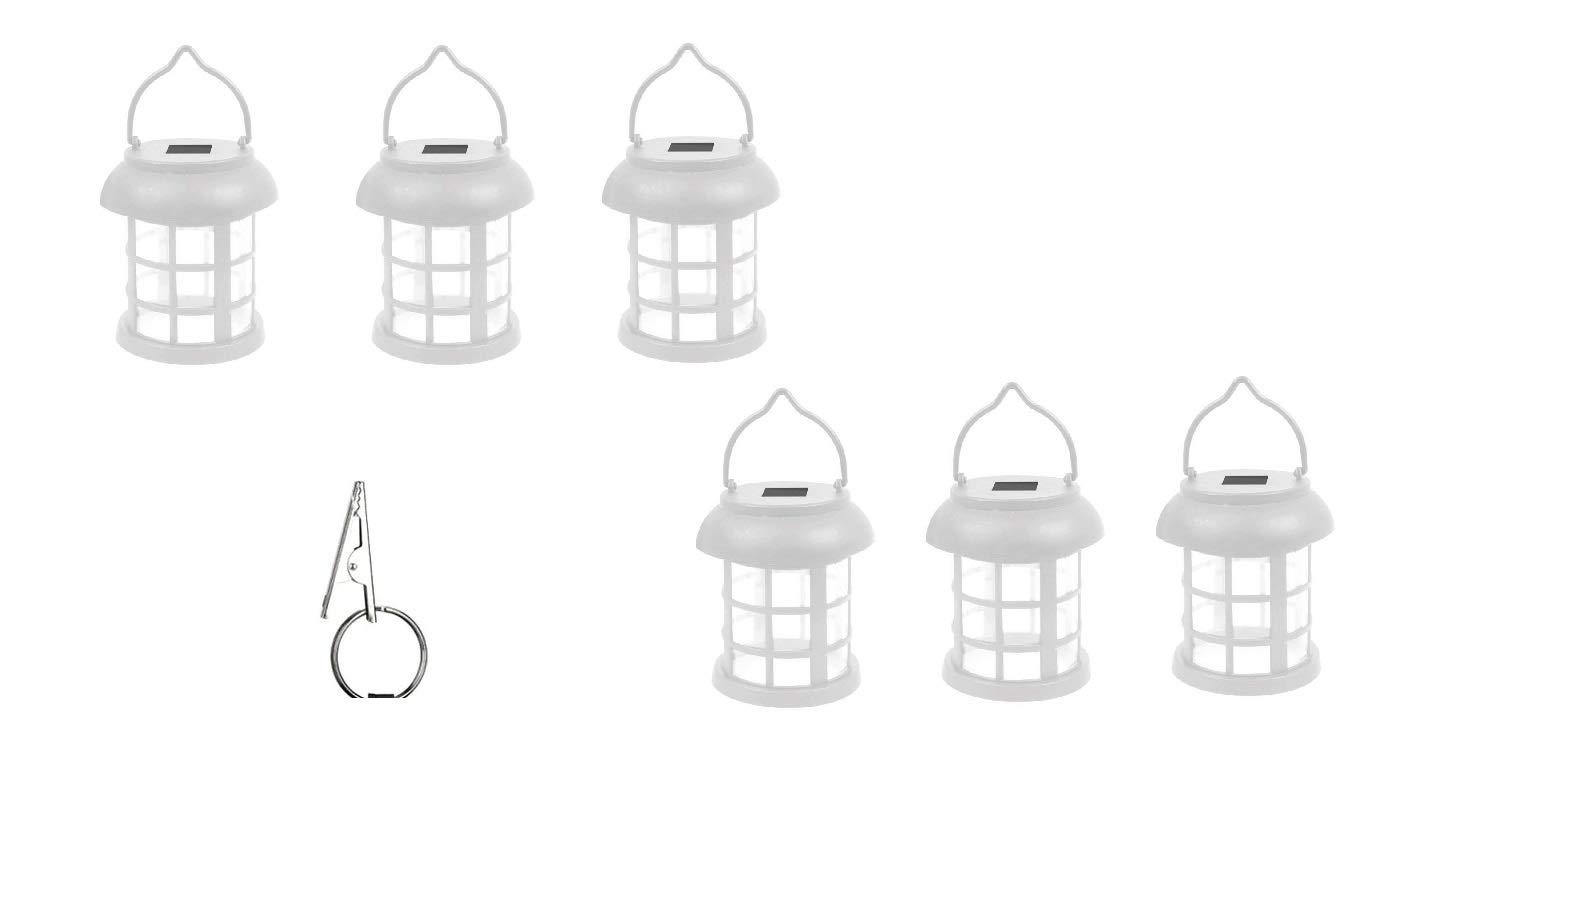 Hanging Solar Patio Umbrella Lanterns with Umbrella Clips - Set of 6 - White